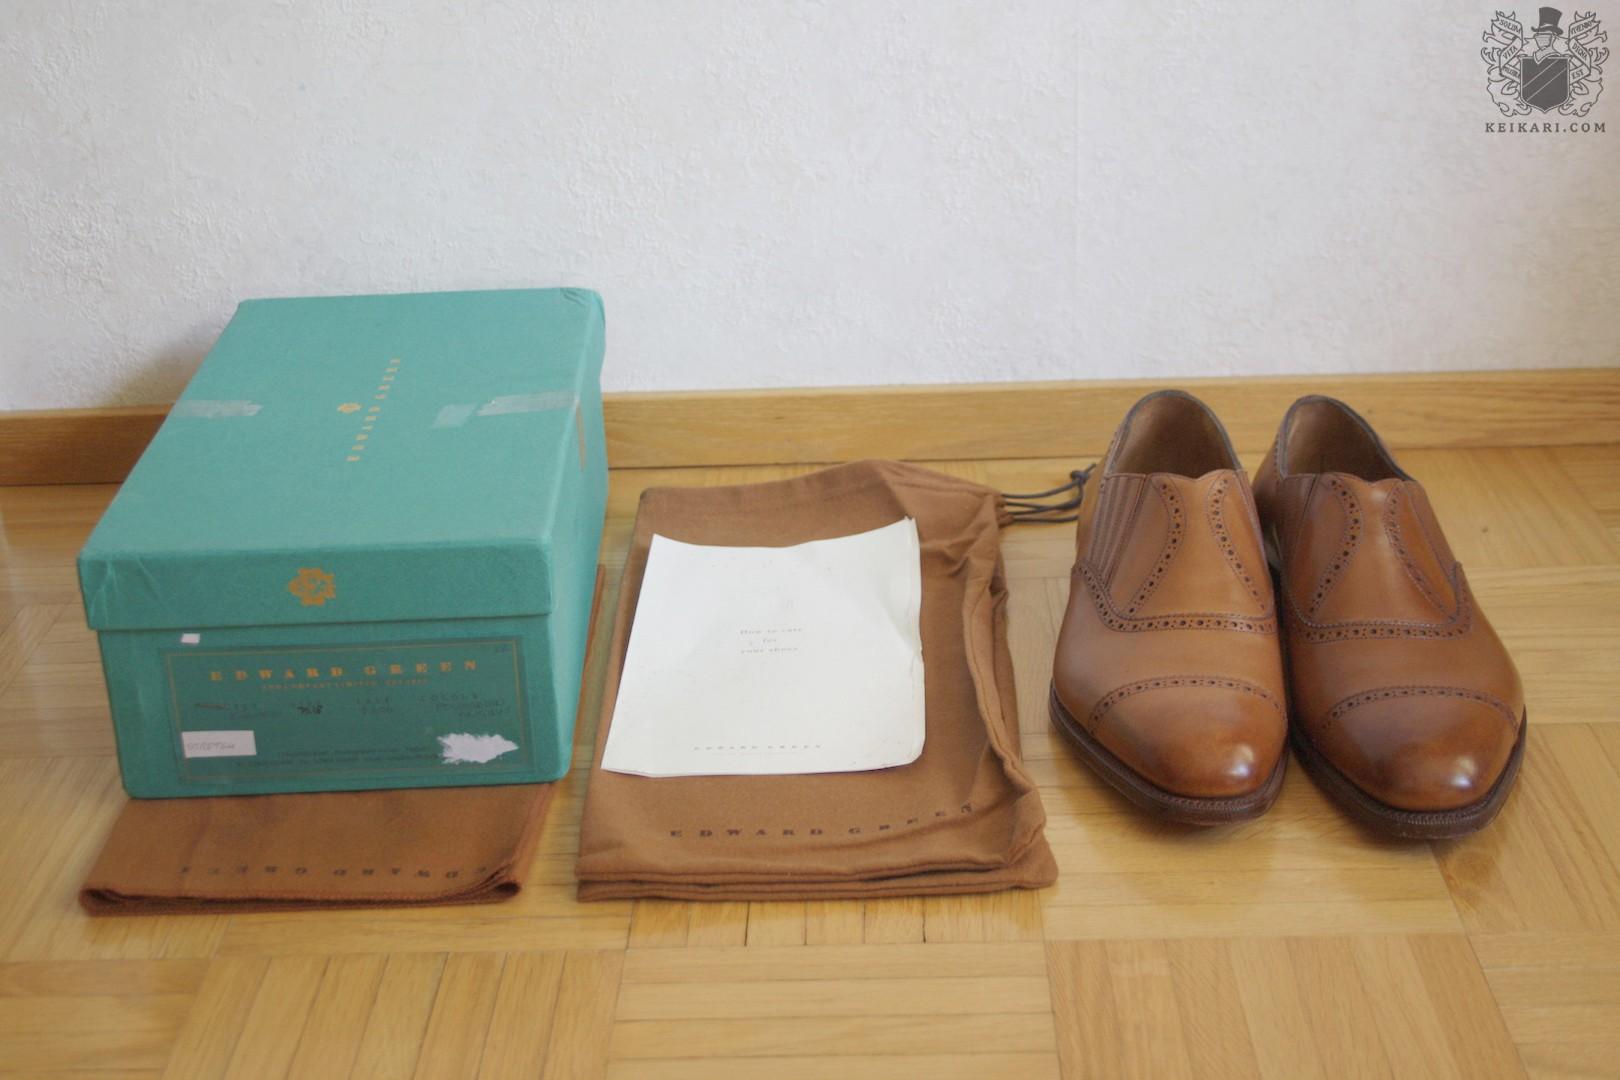 edward_green_kibworth_side_elastic_shoes_at_keikari_dot_com